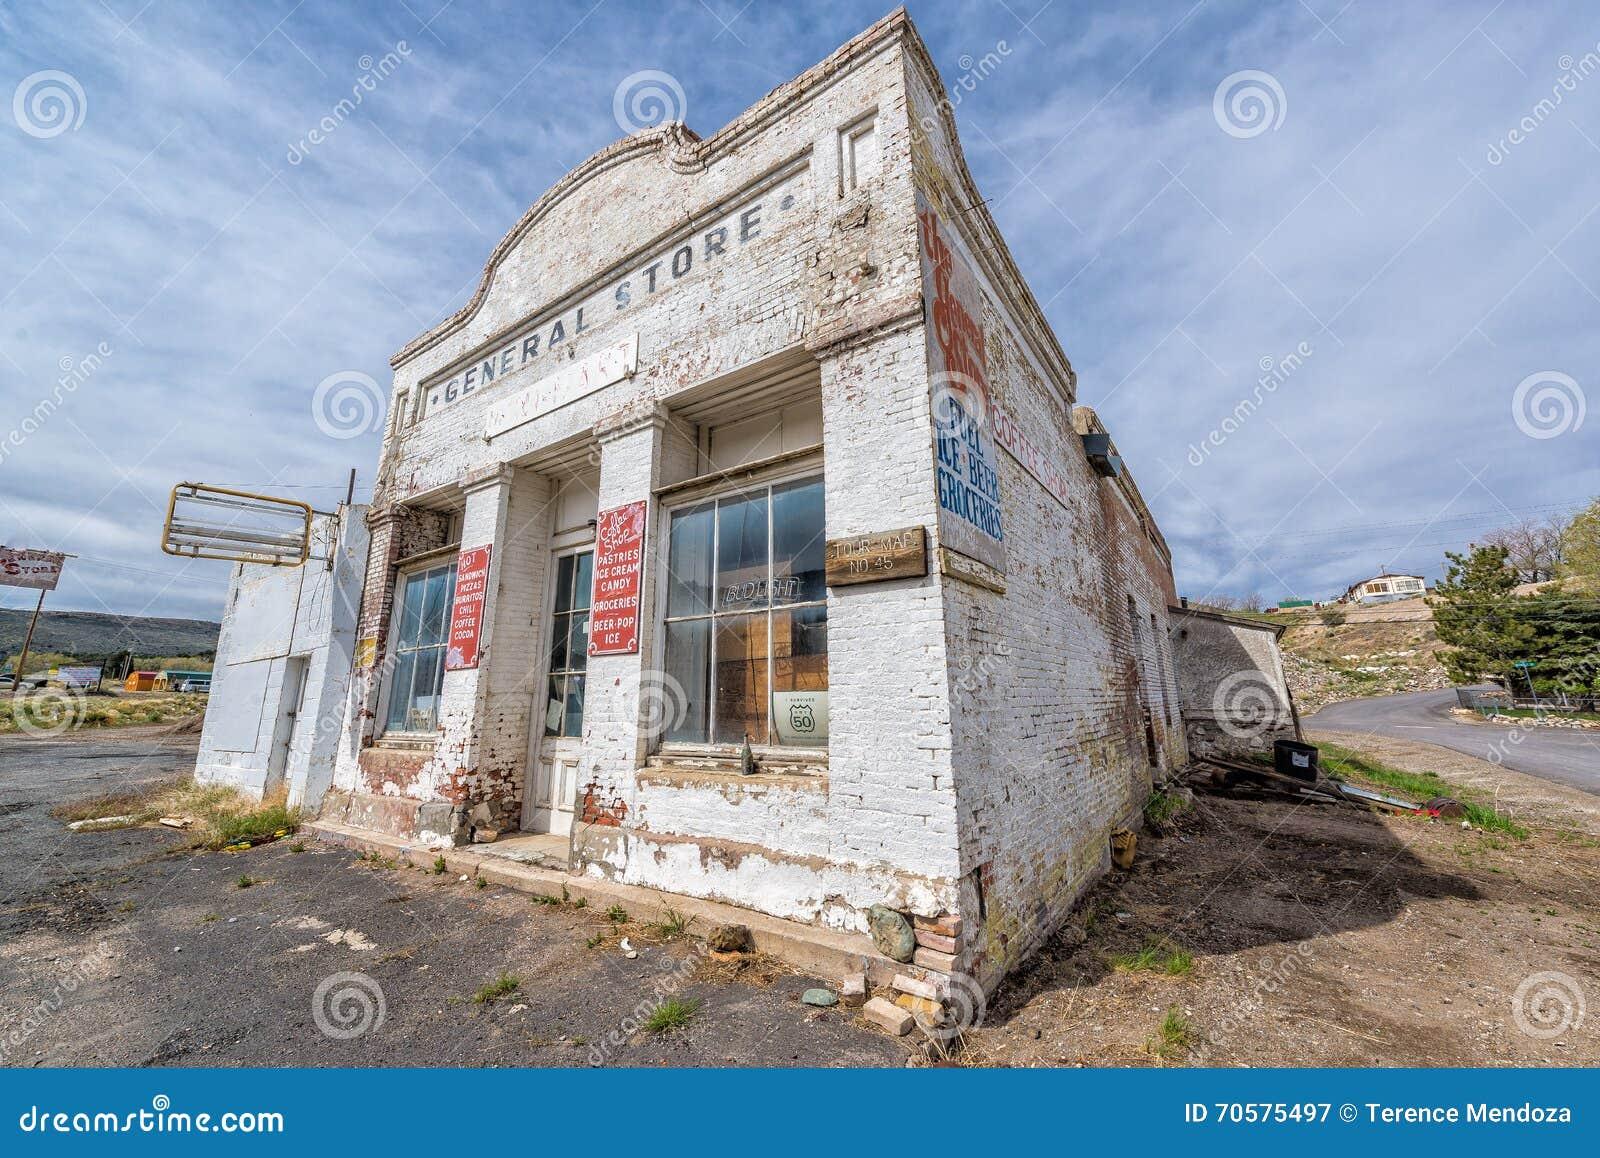 Mesquite NV Real EstateArizona Nevada HomesHomes NV